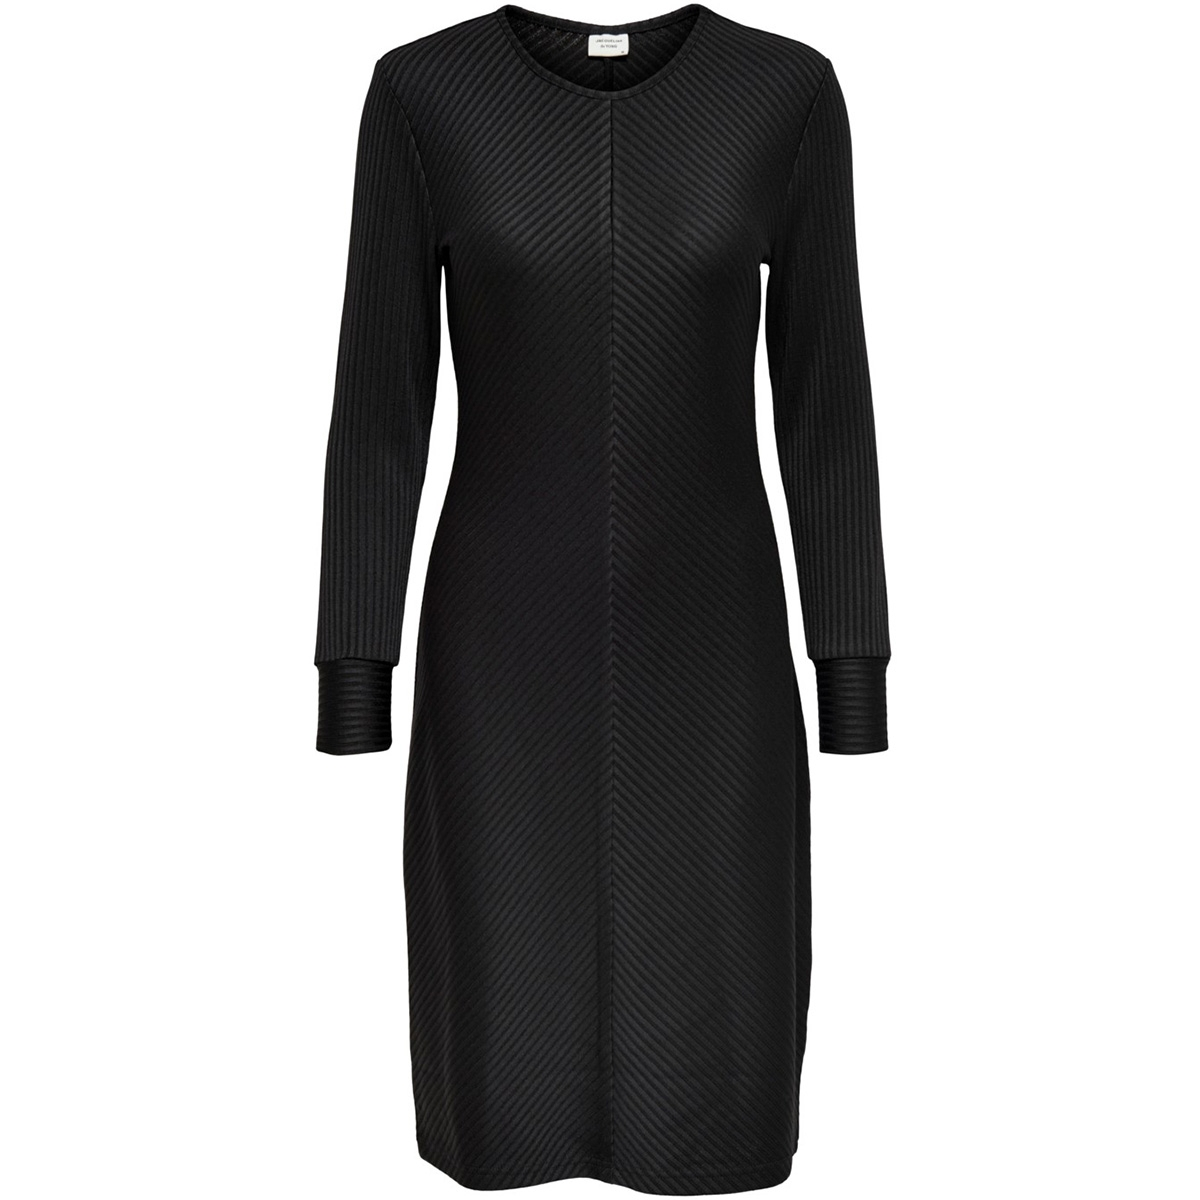 jdytabby l/s striped dress jrs exp 15188062 jacqueline de yong jurk black